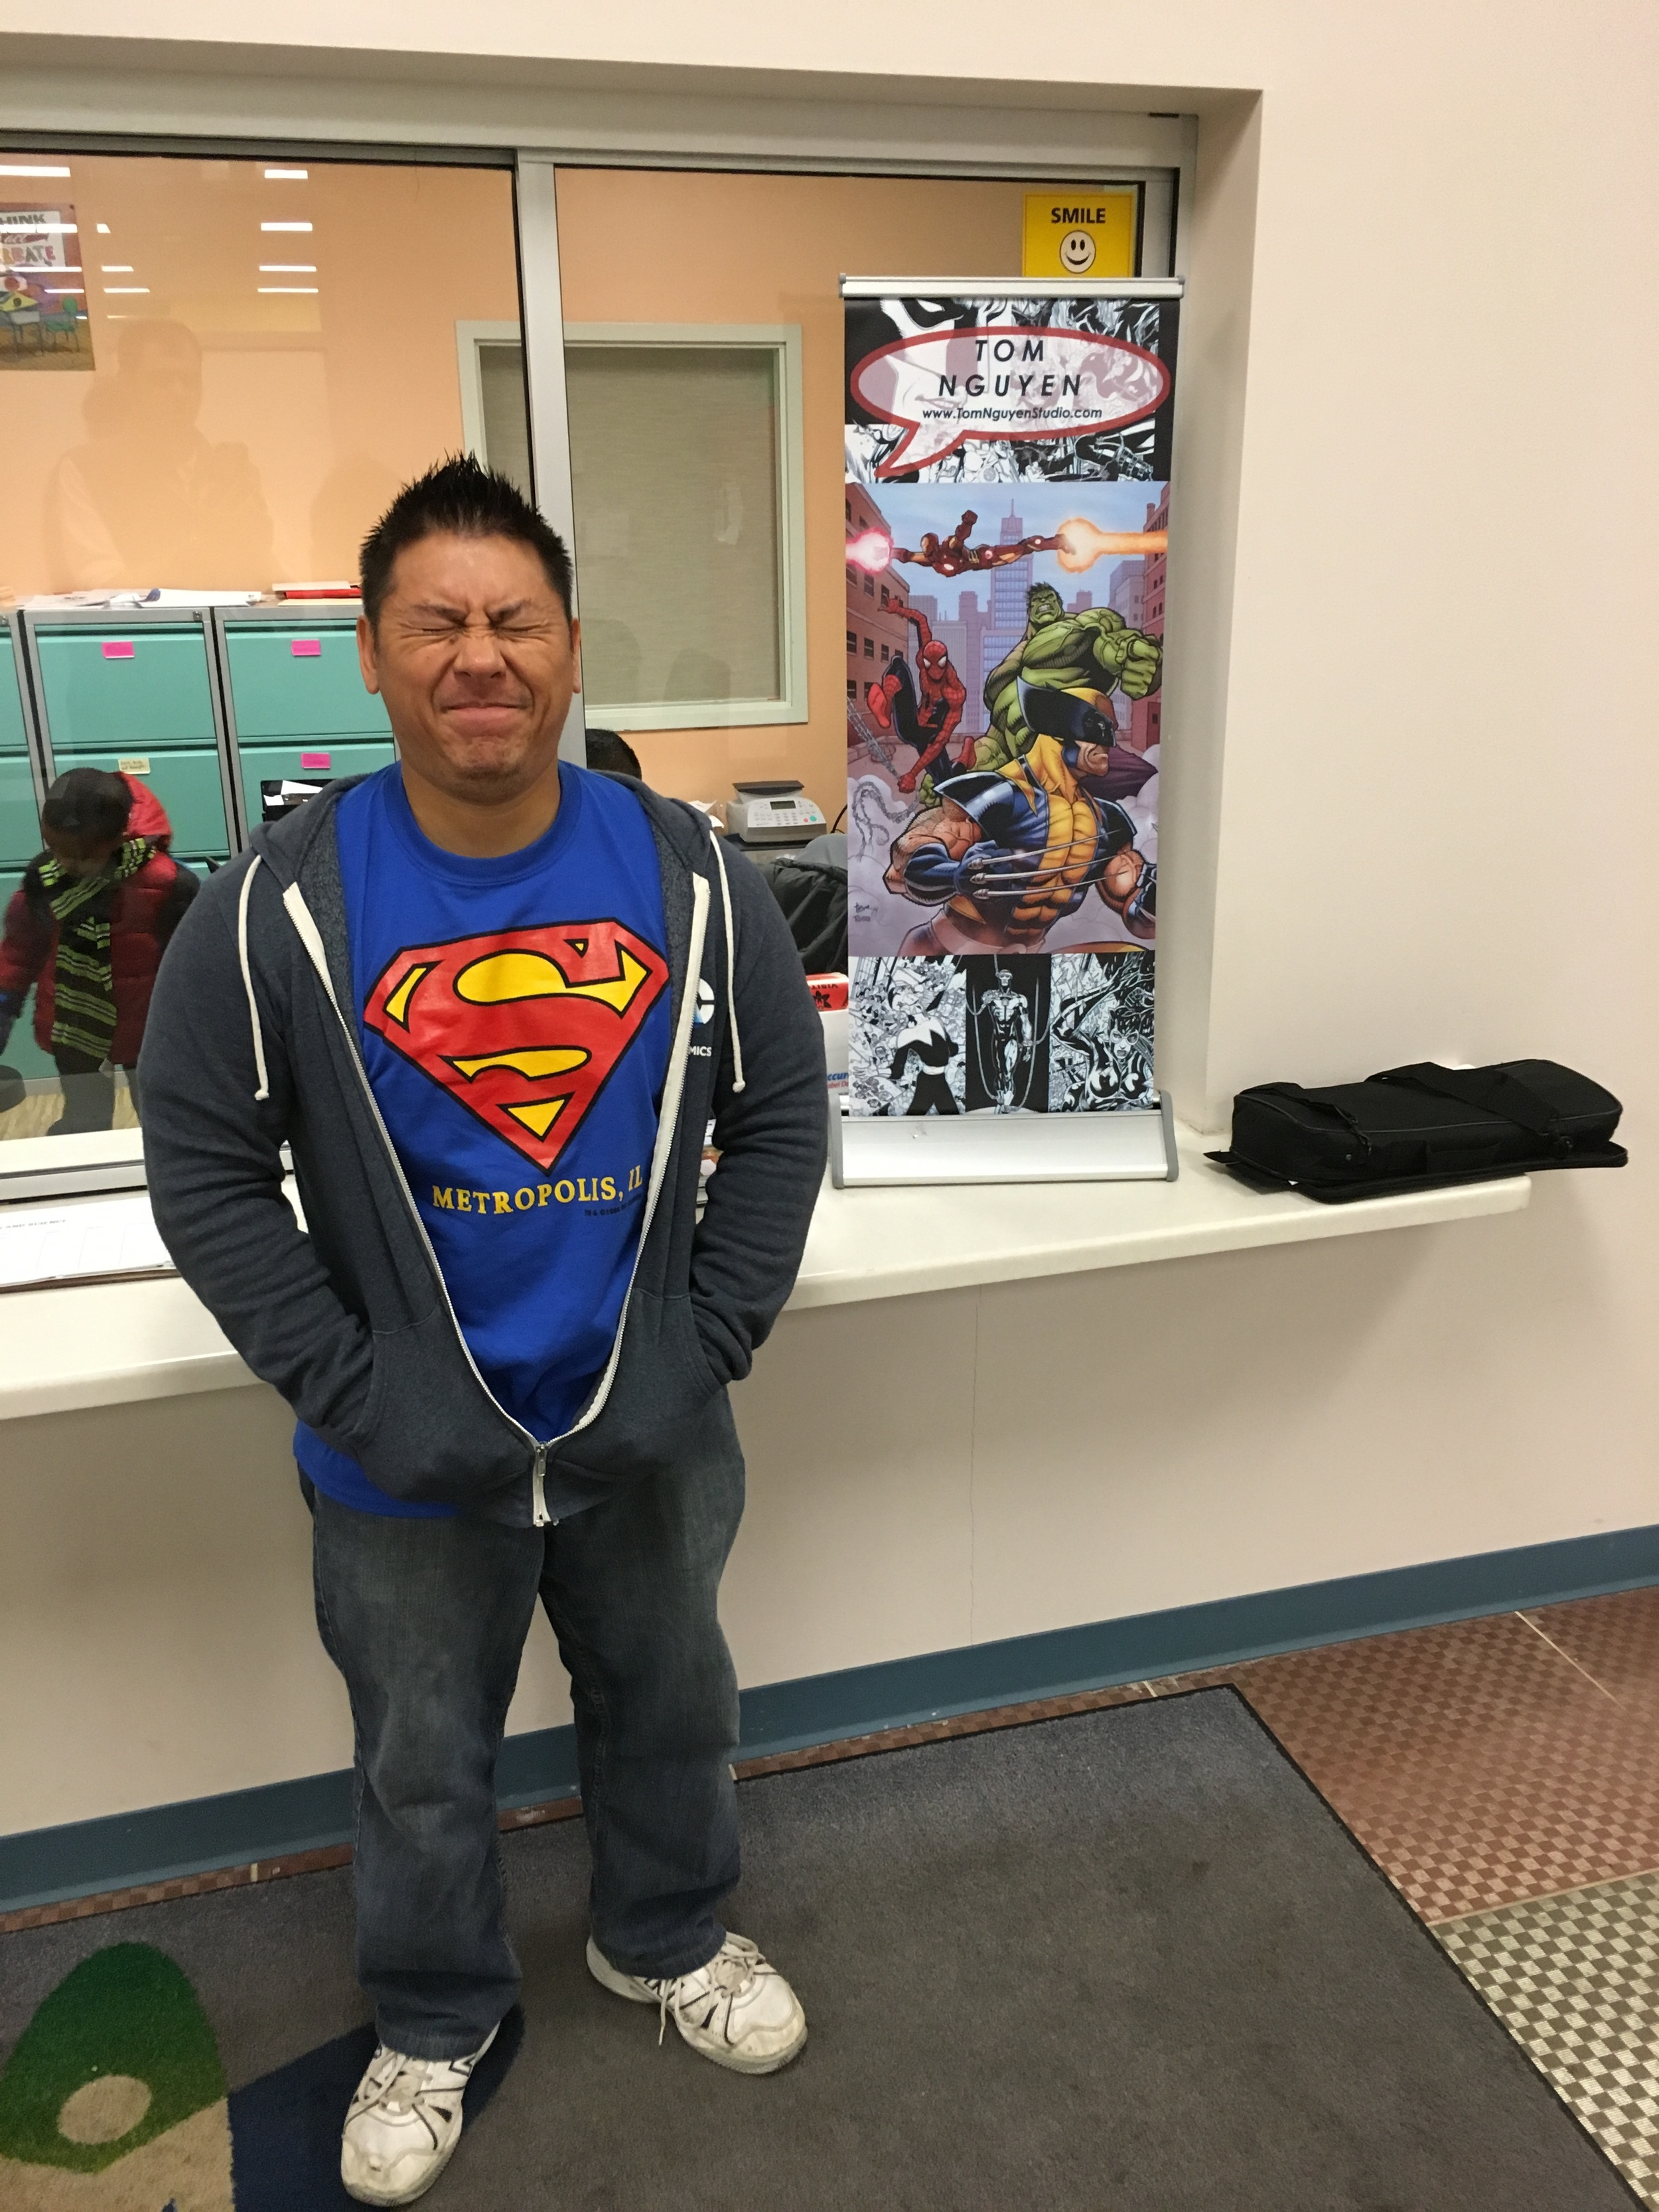 what a nerd, Superman shirt + DC Comics hoodie